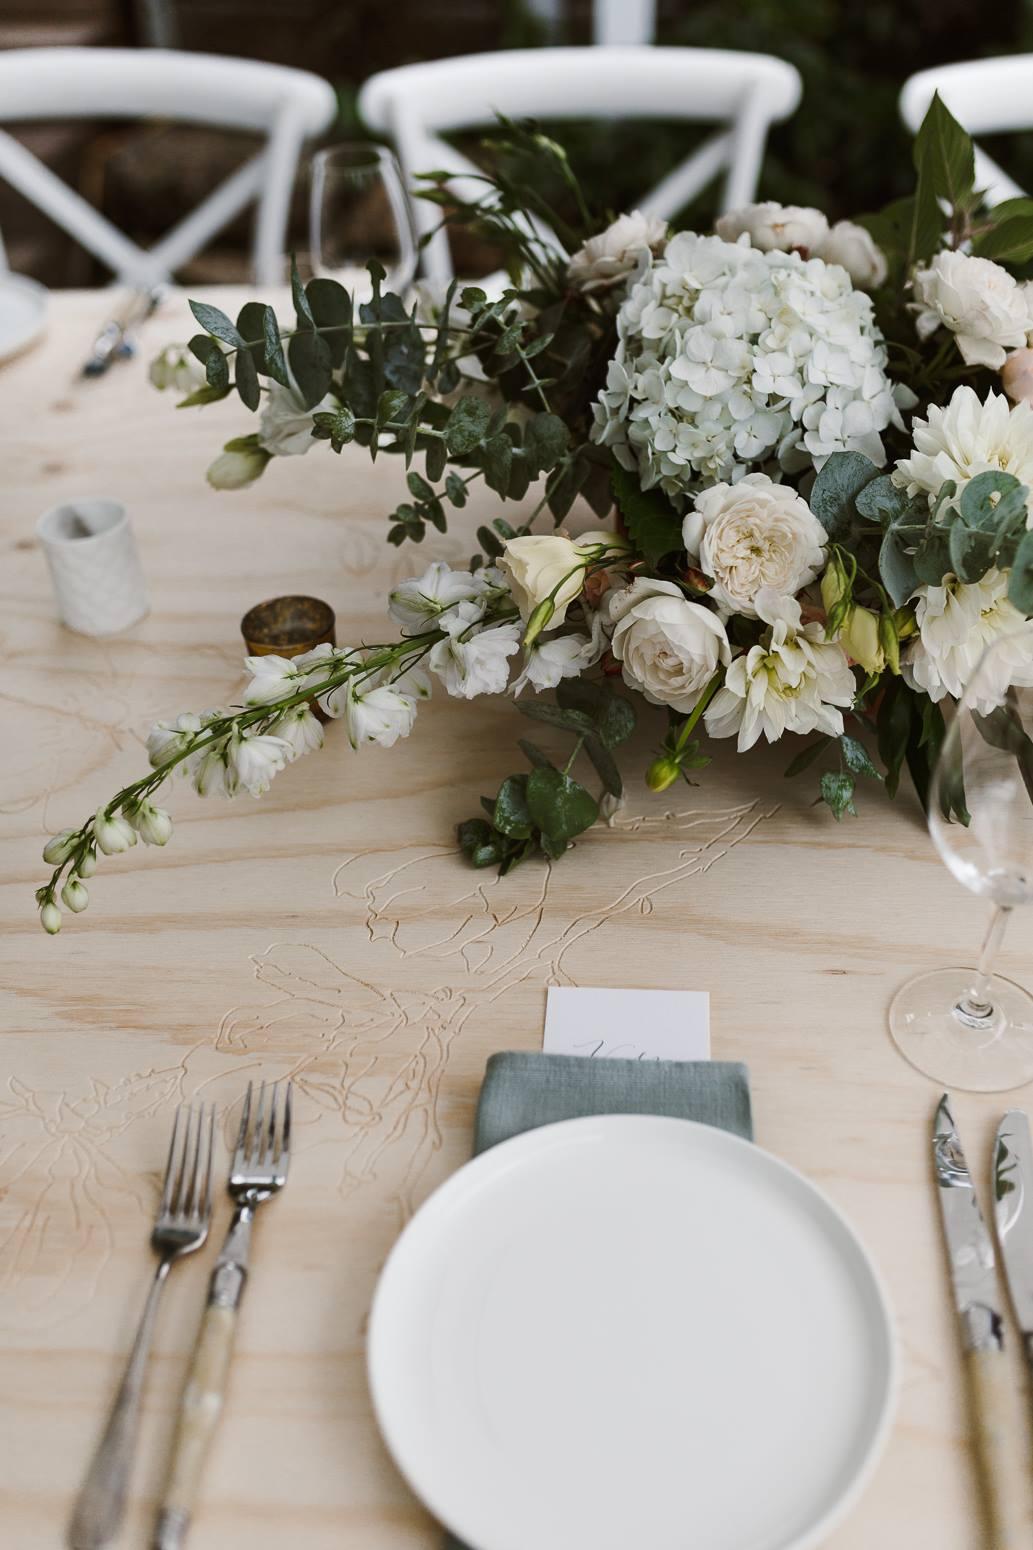 Wedding Photographer, Melbourne Wedding, Georgeous Occasions, Blossom Daisy Creative